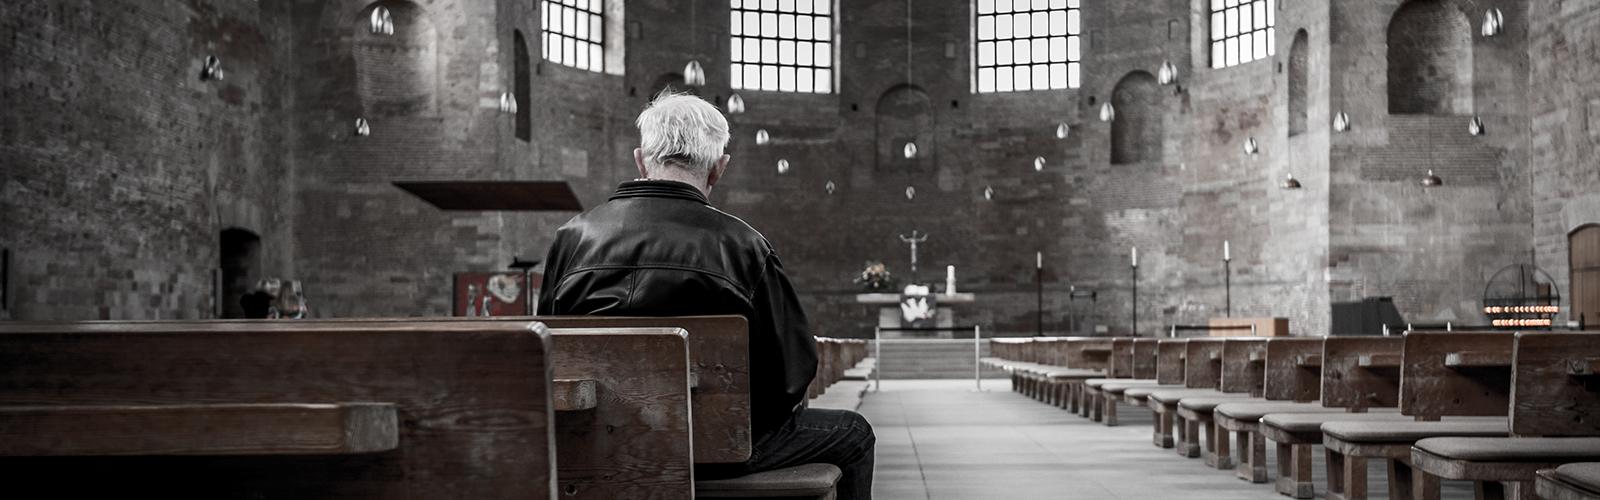 Old Man sitting in a church